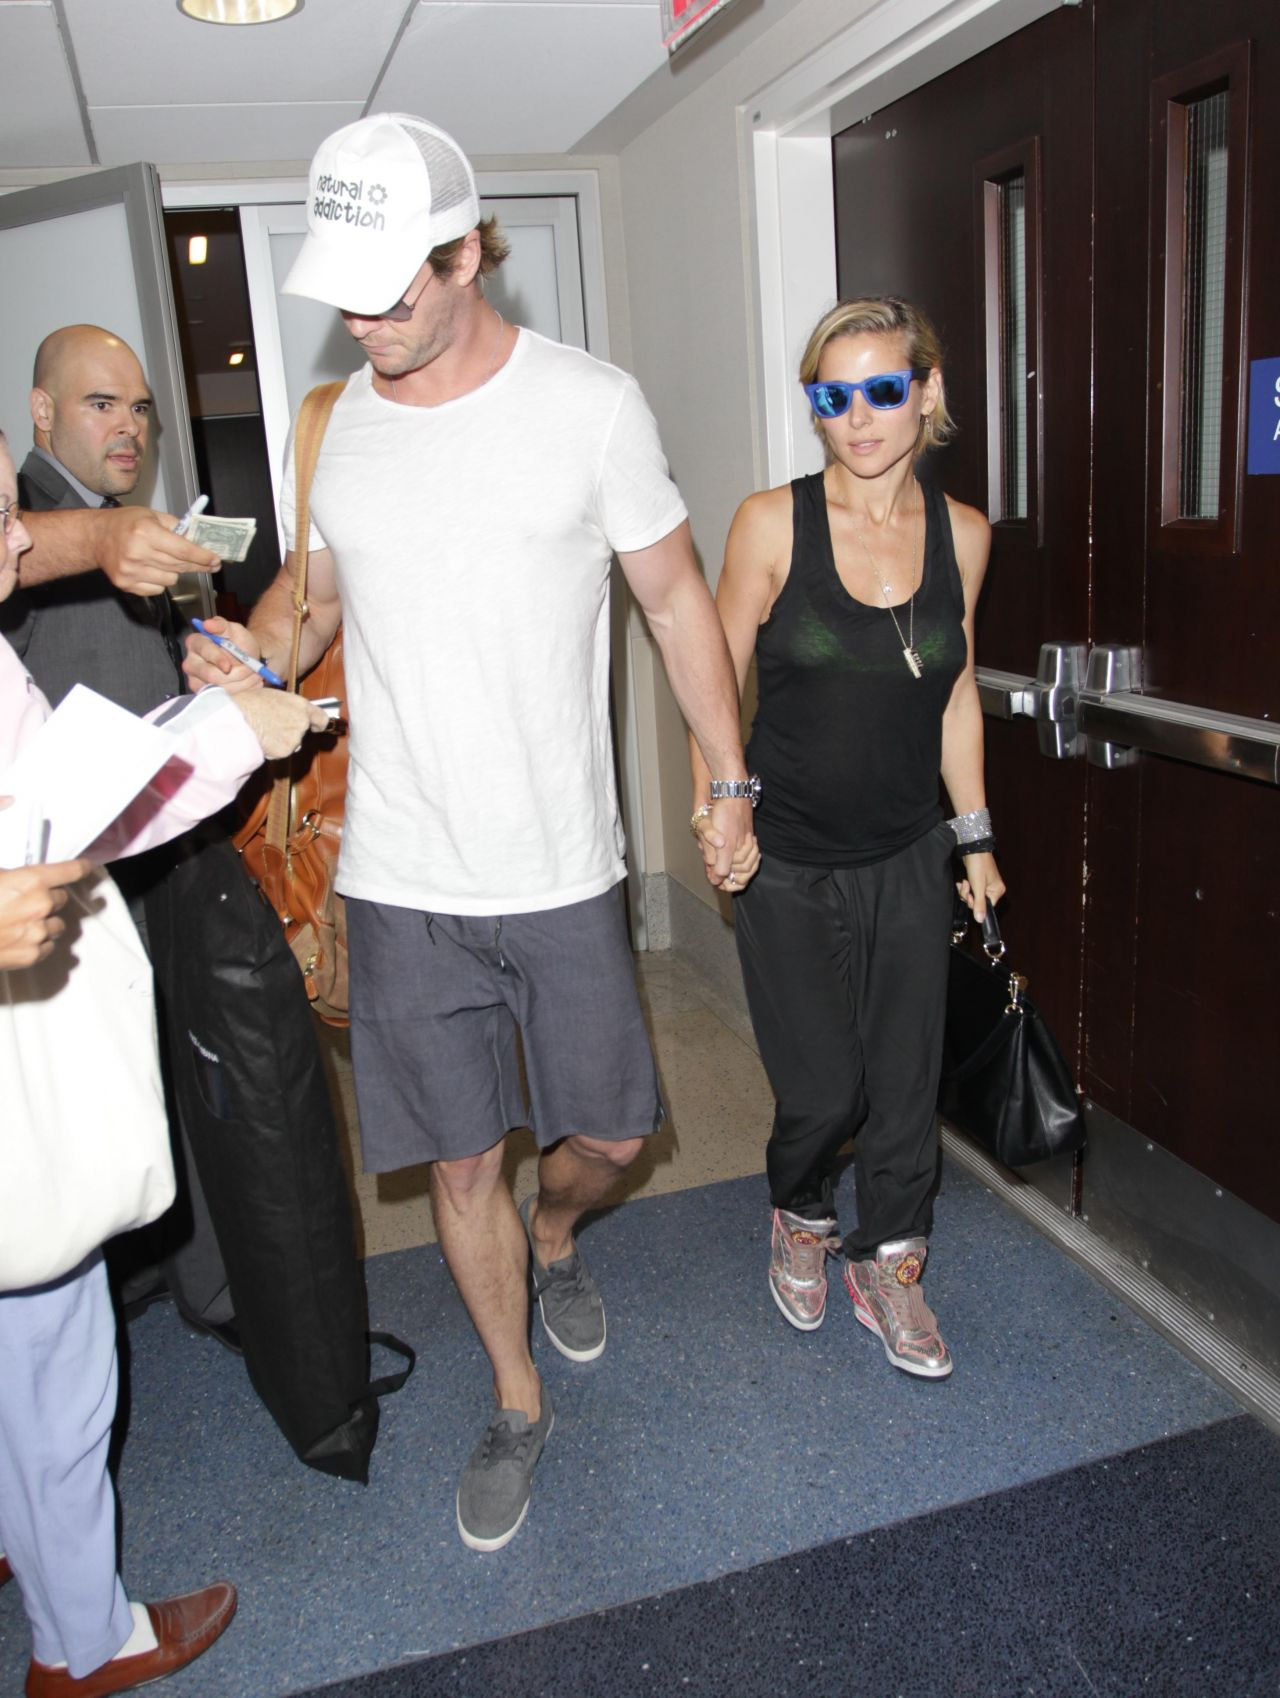 Elsa Pataky & Chris Hemsworth - Aarrives at LAX Airport in Los Angeles -  August 2014 • CelebMafia